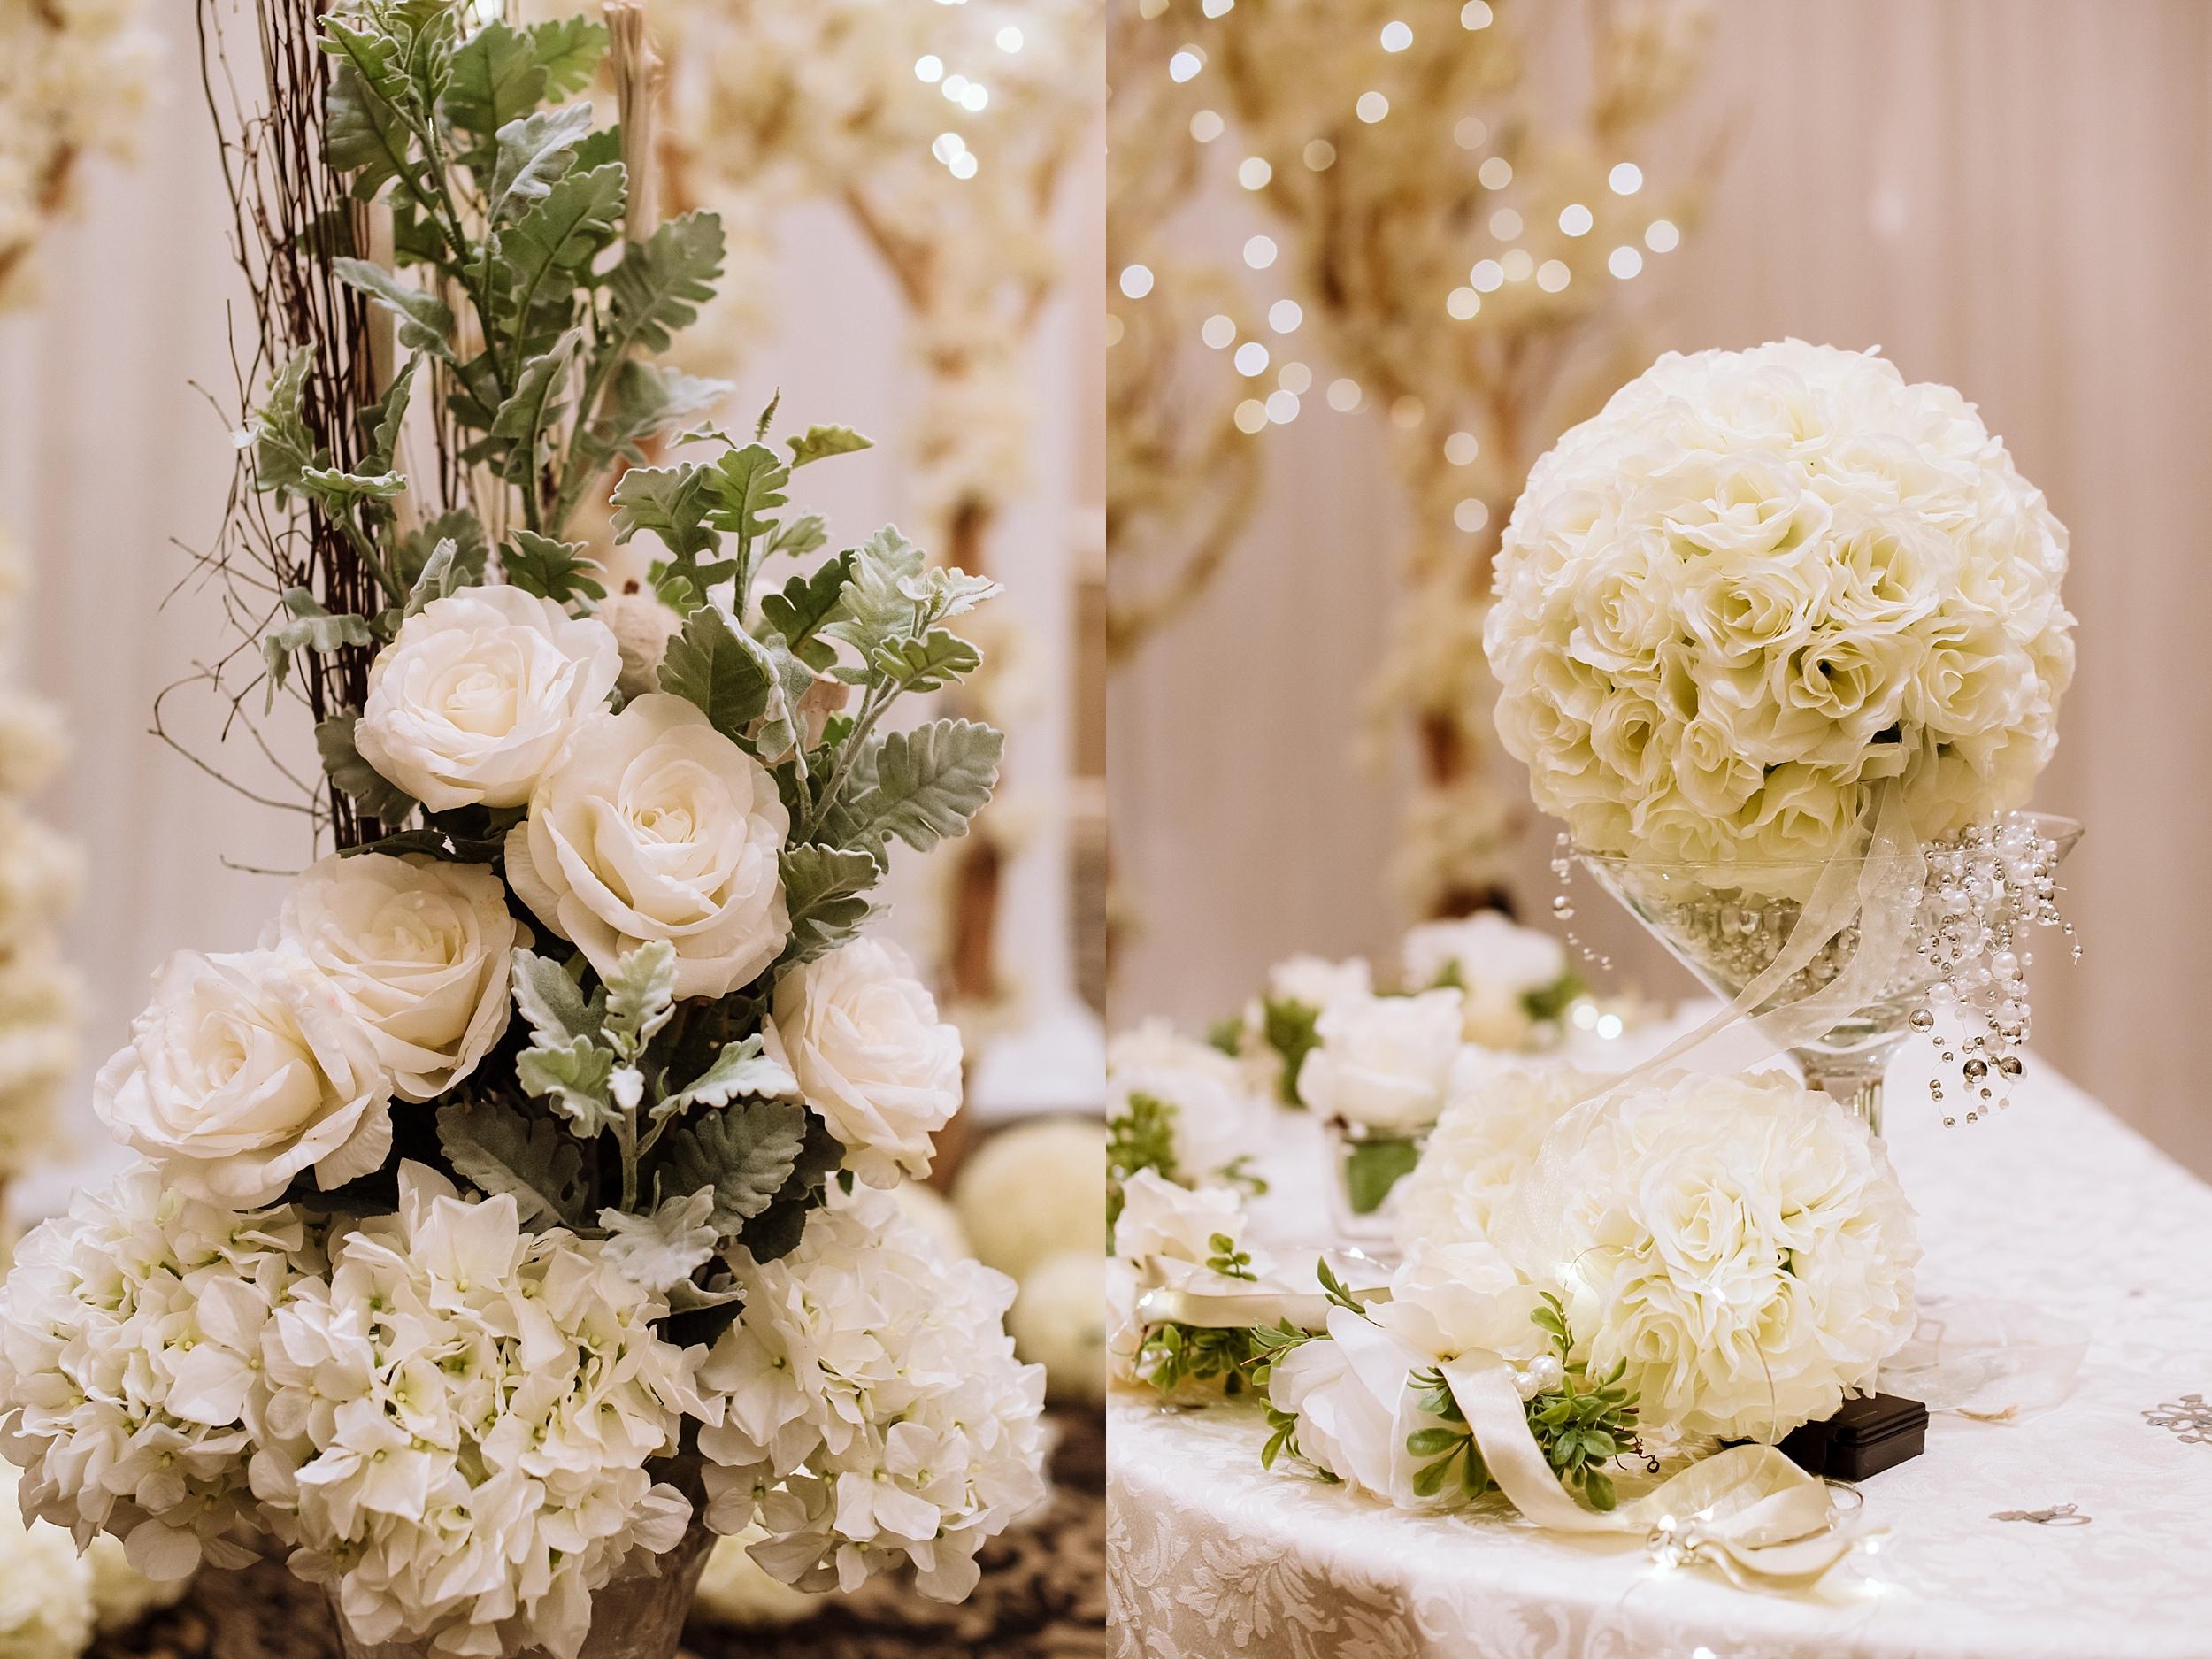 McMichael_Art_Collection_Wedding_chateau_le_jardin_Justine_Munro_Toronto_Photographer047.jpg